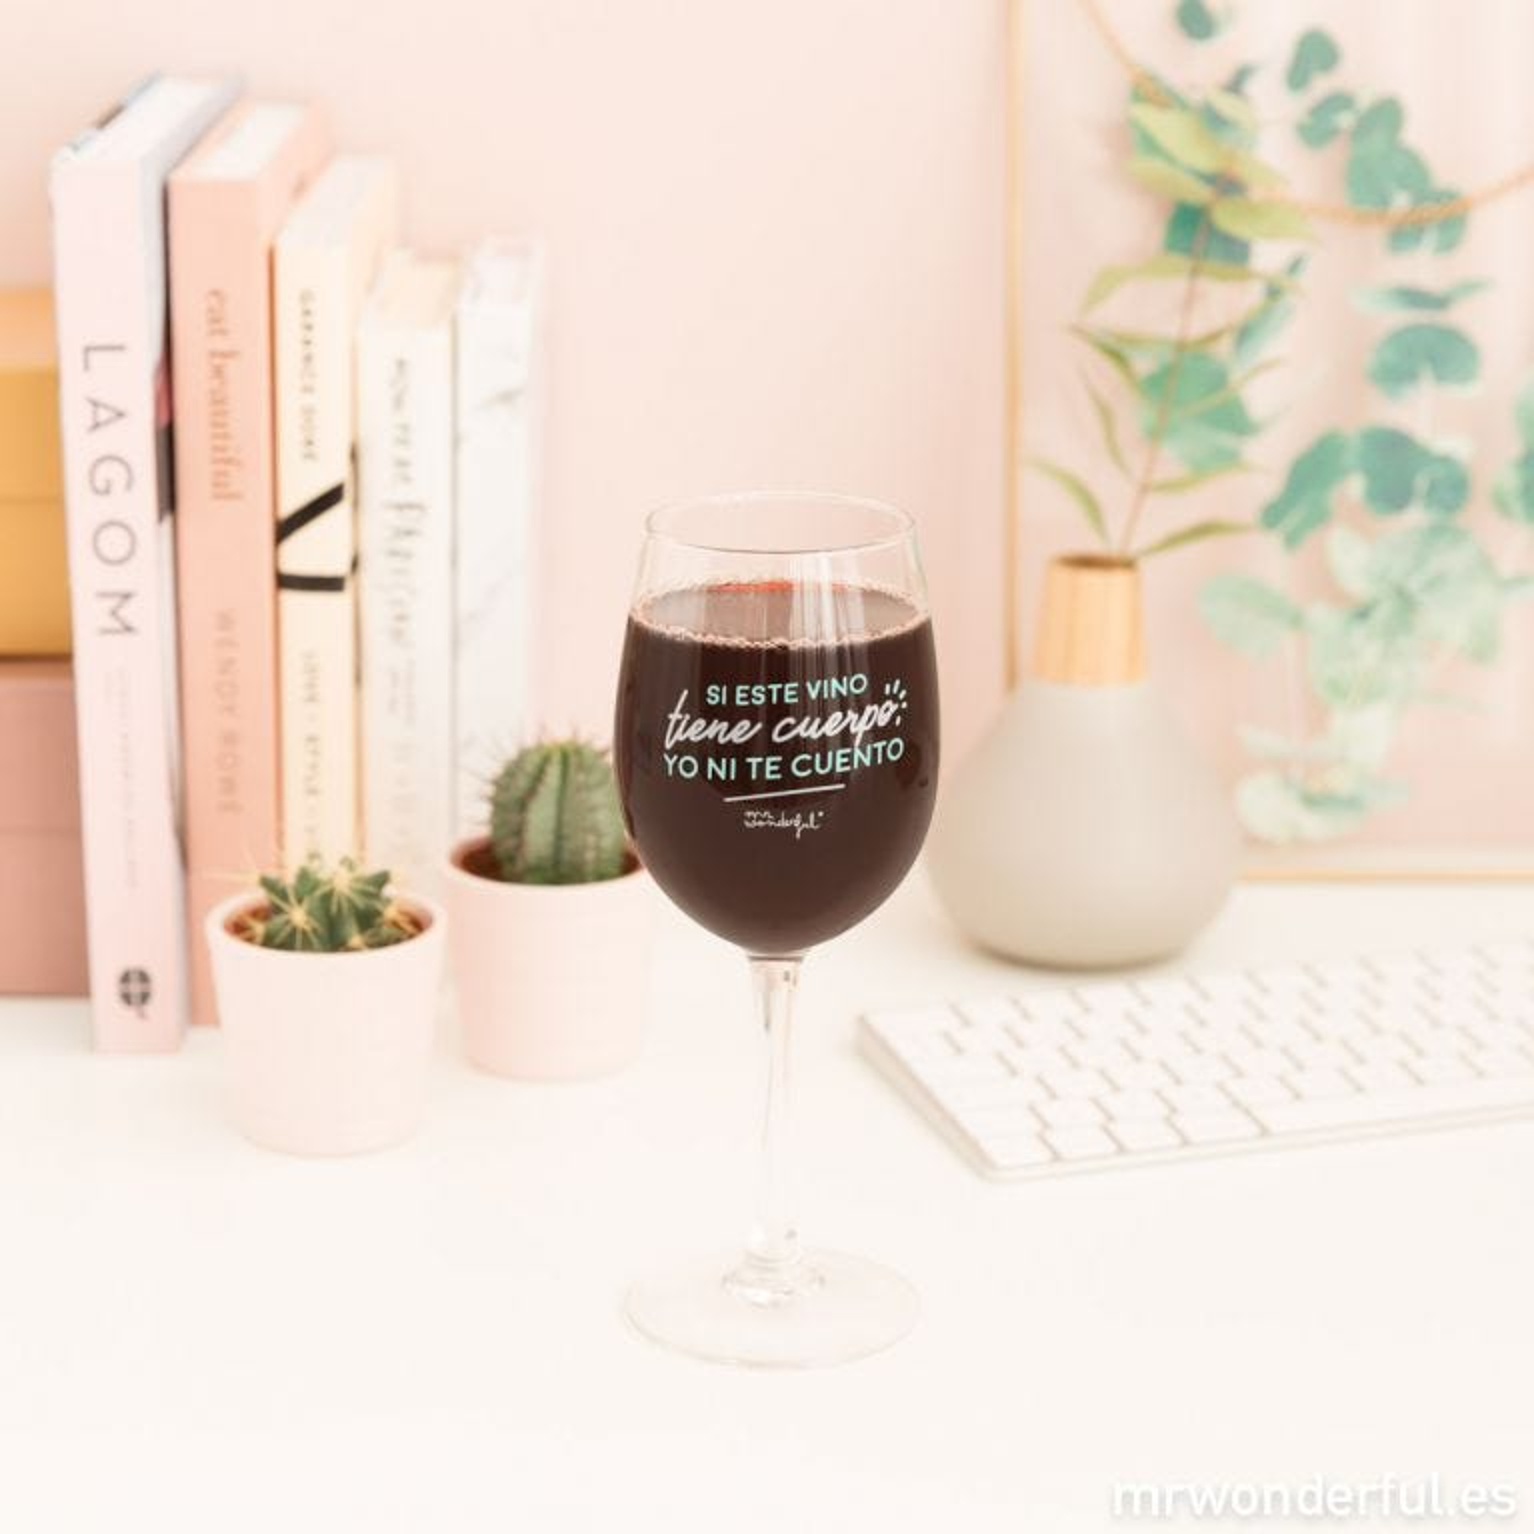 Copa de vino para brindar por ti